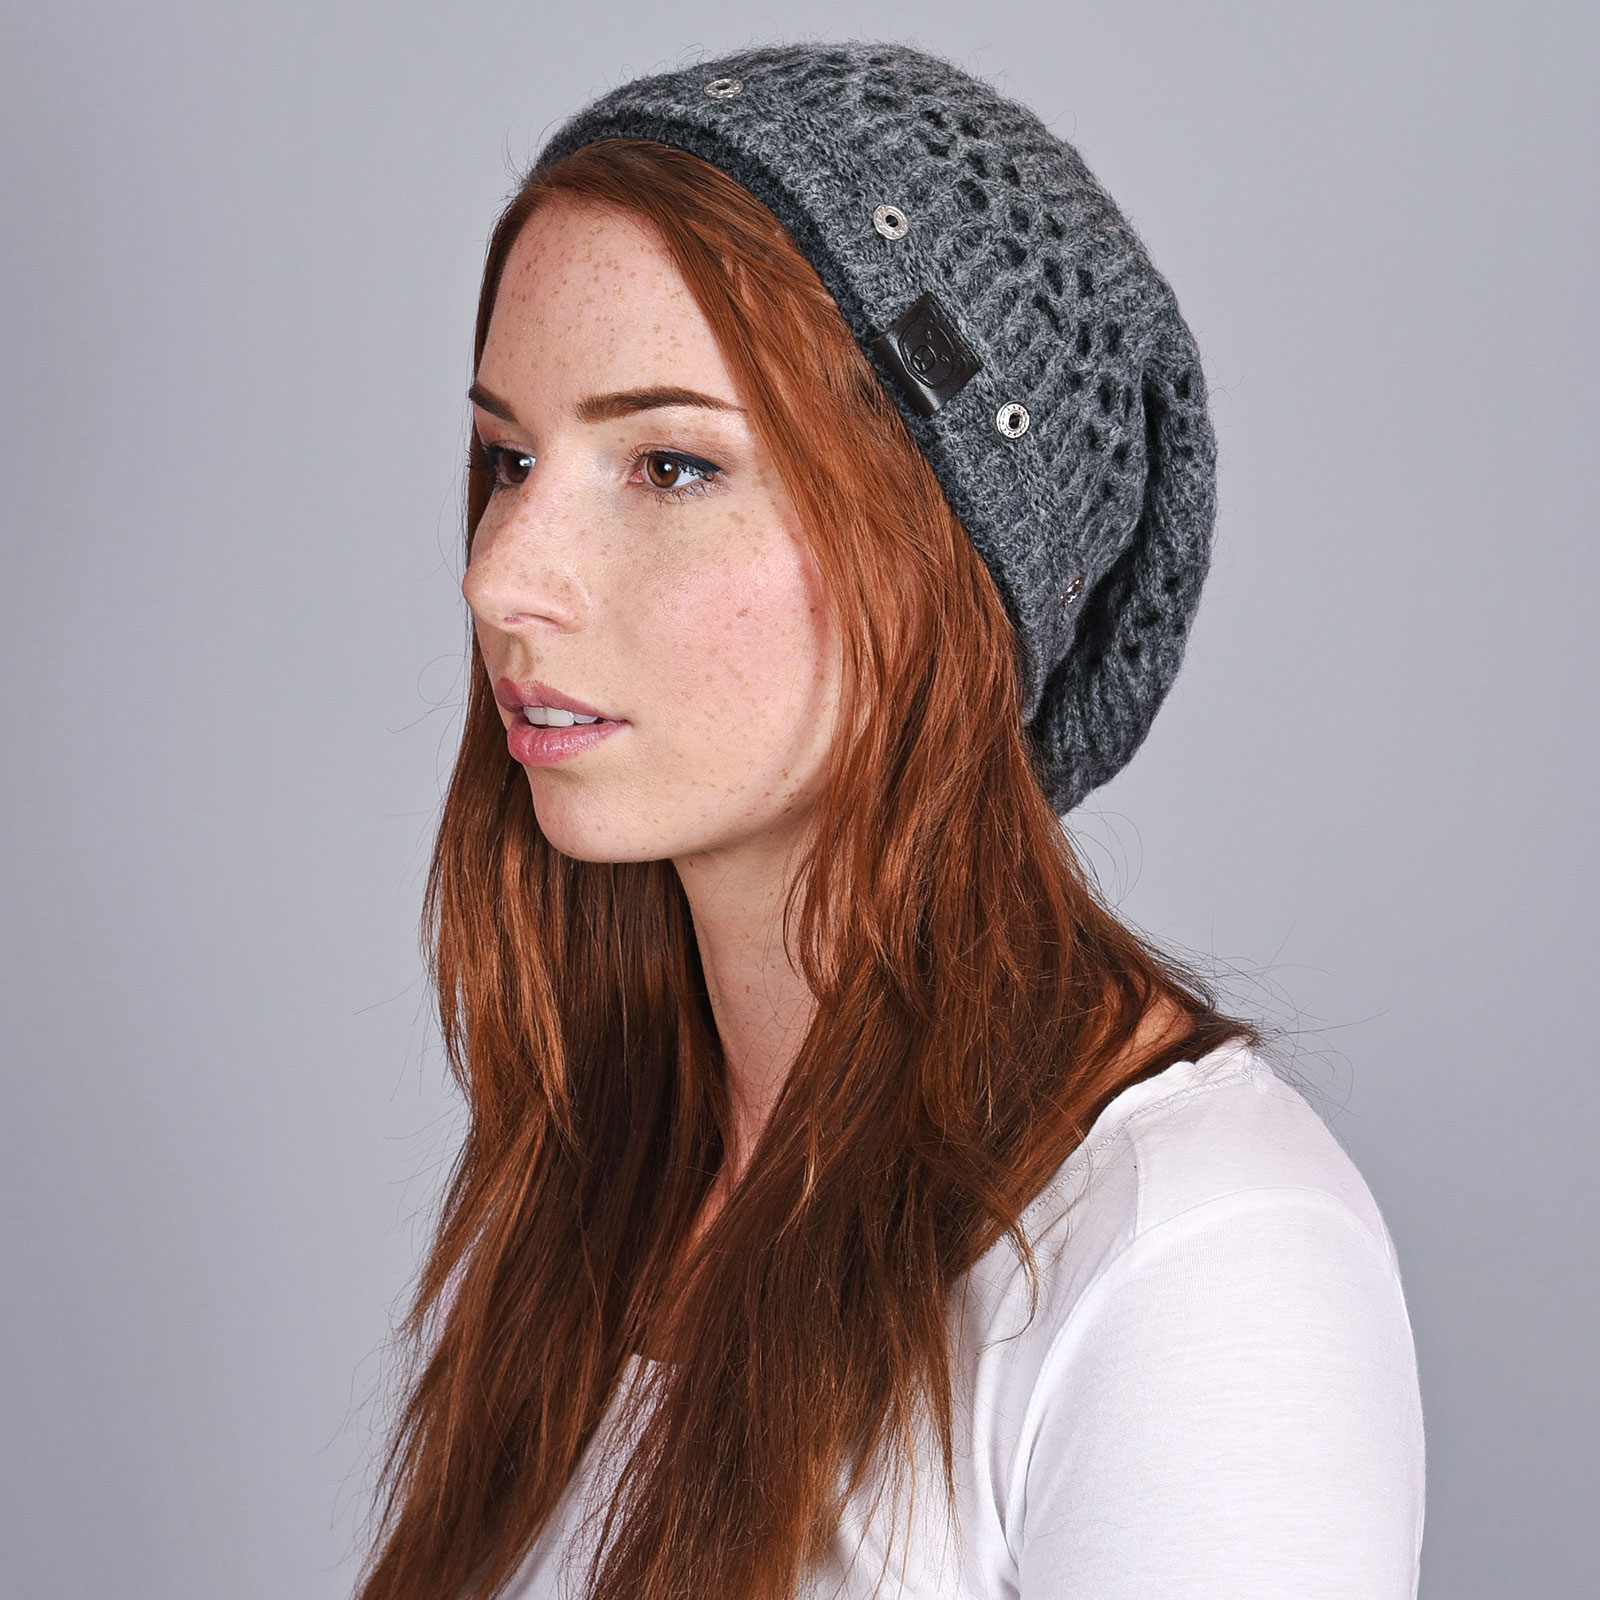 CP-01055-VF16-1-bonnet-femme-fantaisie-gris-anthracite